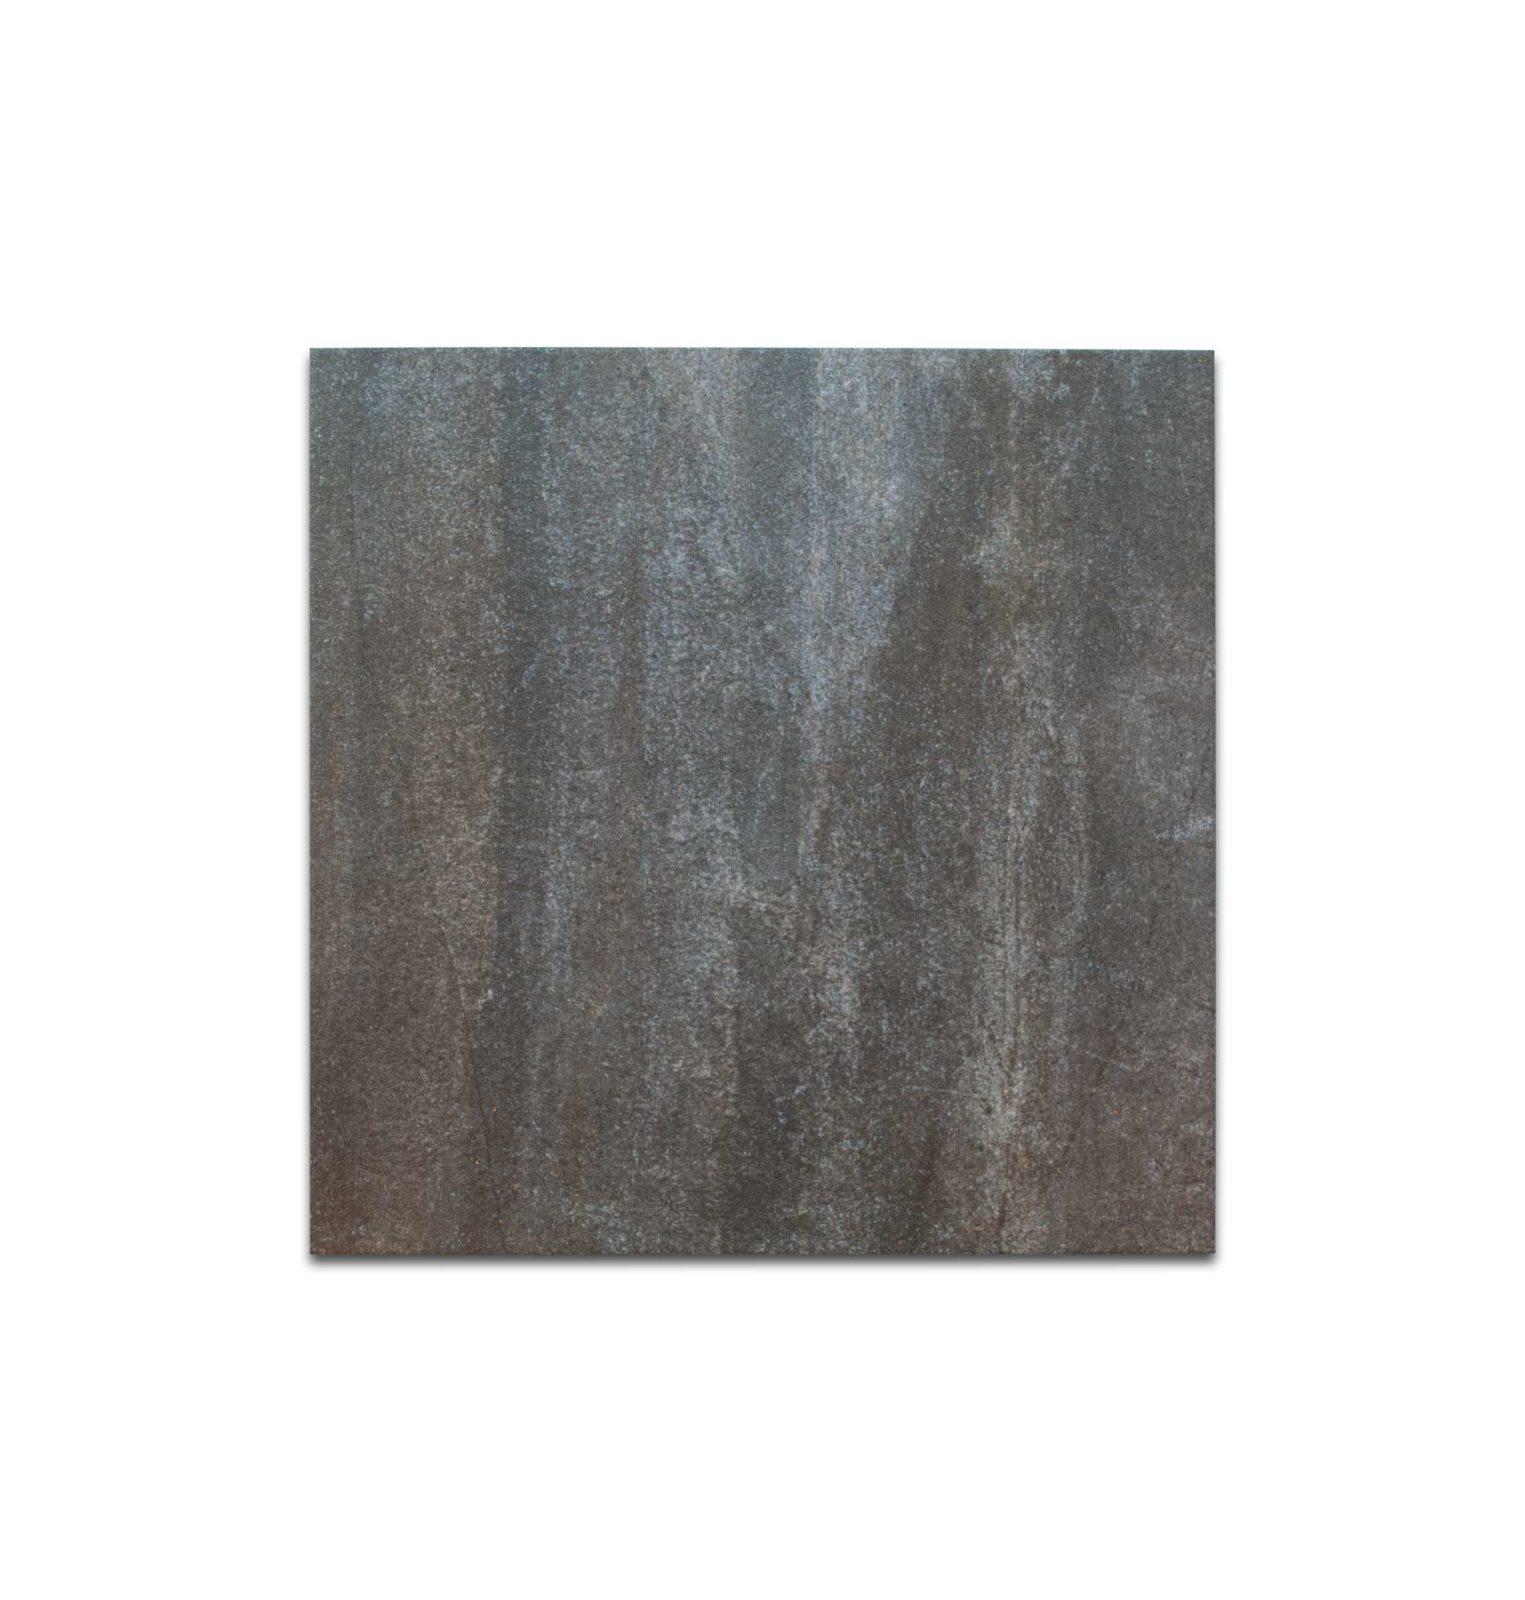 Marazzi Vesale Smoke 13 Quot X 13 Quot Field Tile Schillings